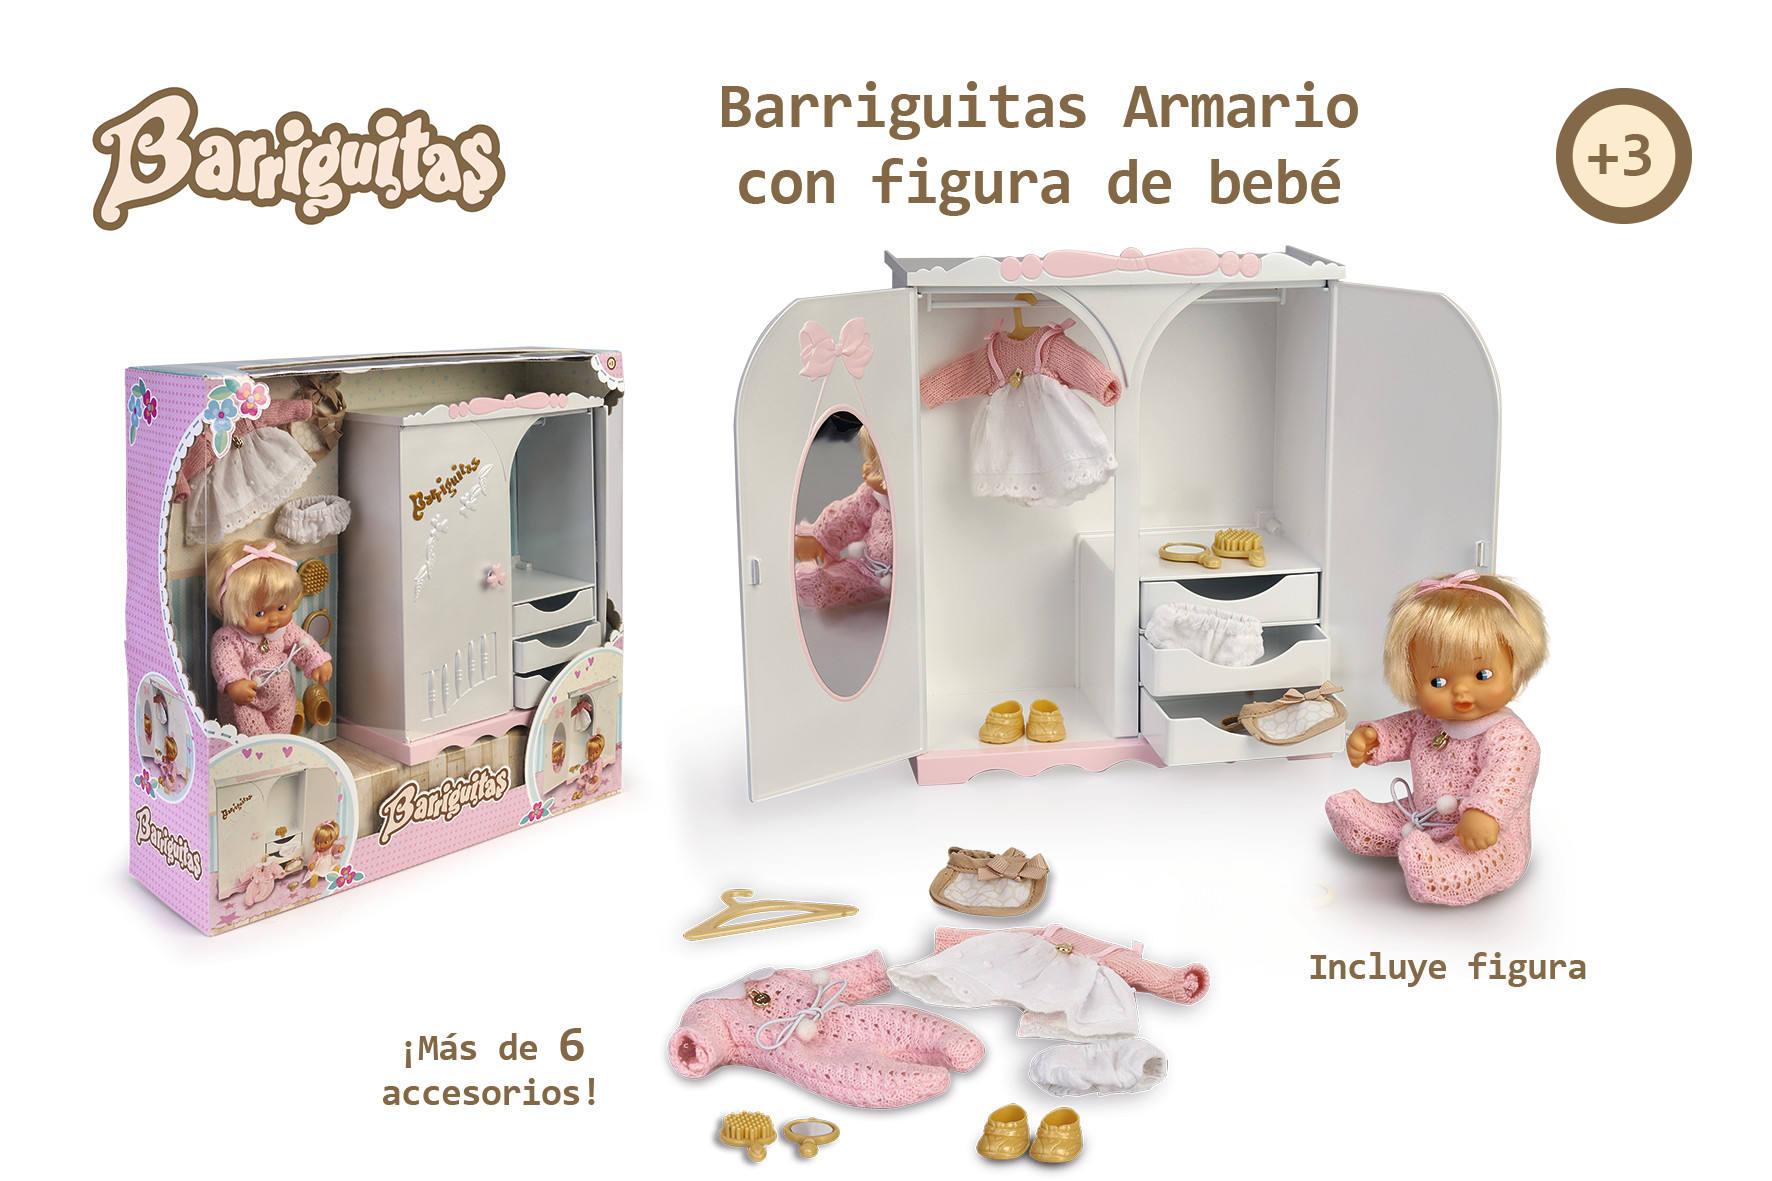 ARMARIO BARRIGUITAS + FIGURA 15811 - N37620